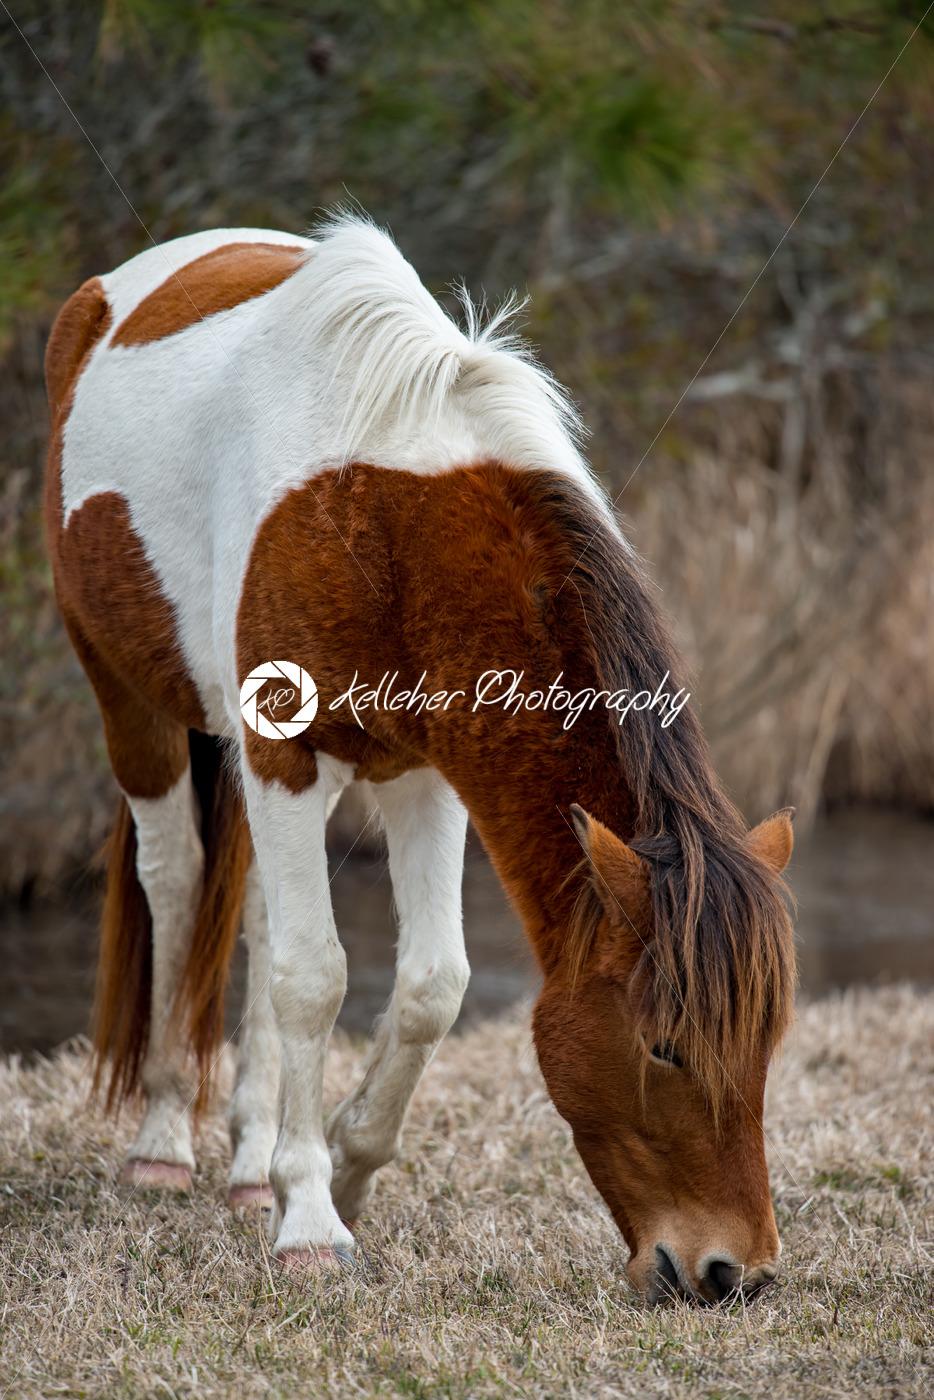 An Assateague wild horse in Maryland - Kelleher Photography Store